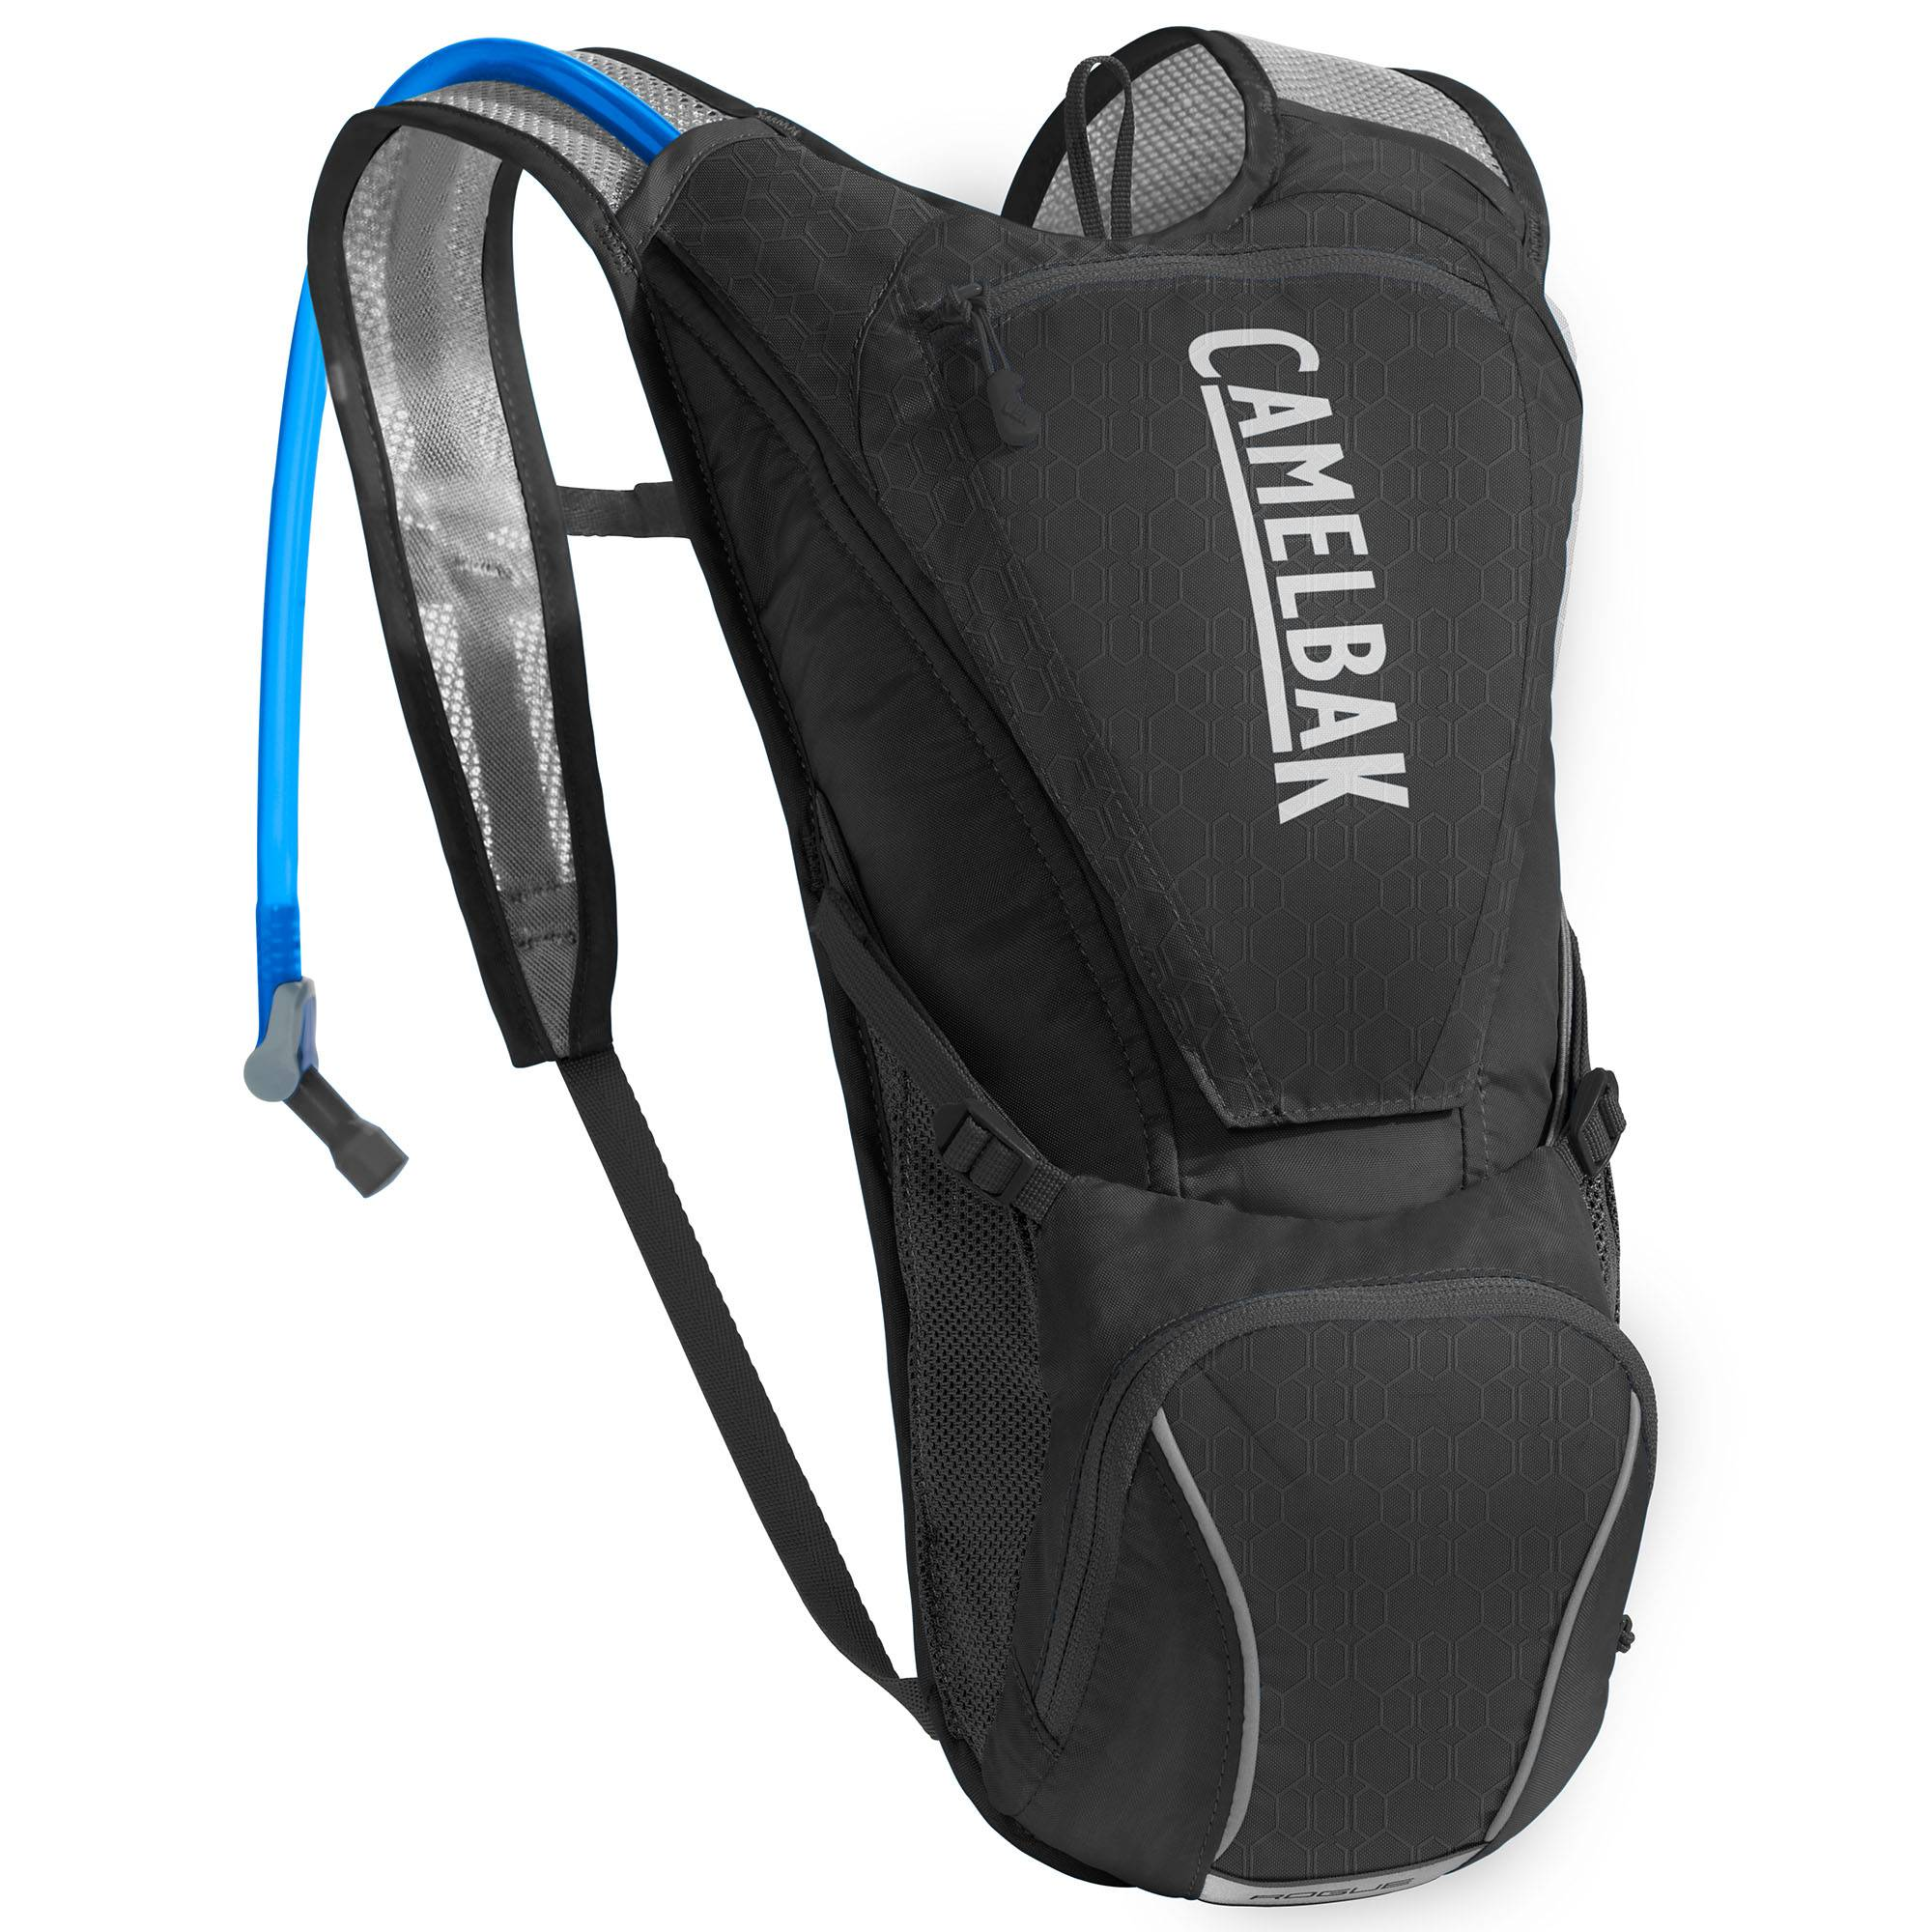 Camelbak Rogue 85 Oz Hydration Pack  - Black/Graphite - Size: One Size